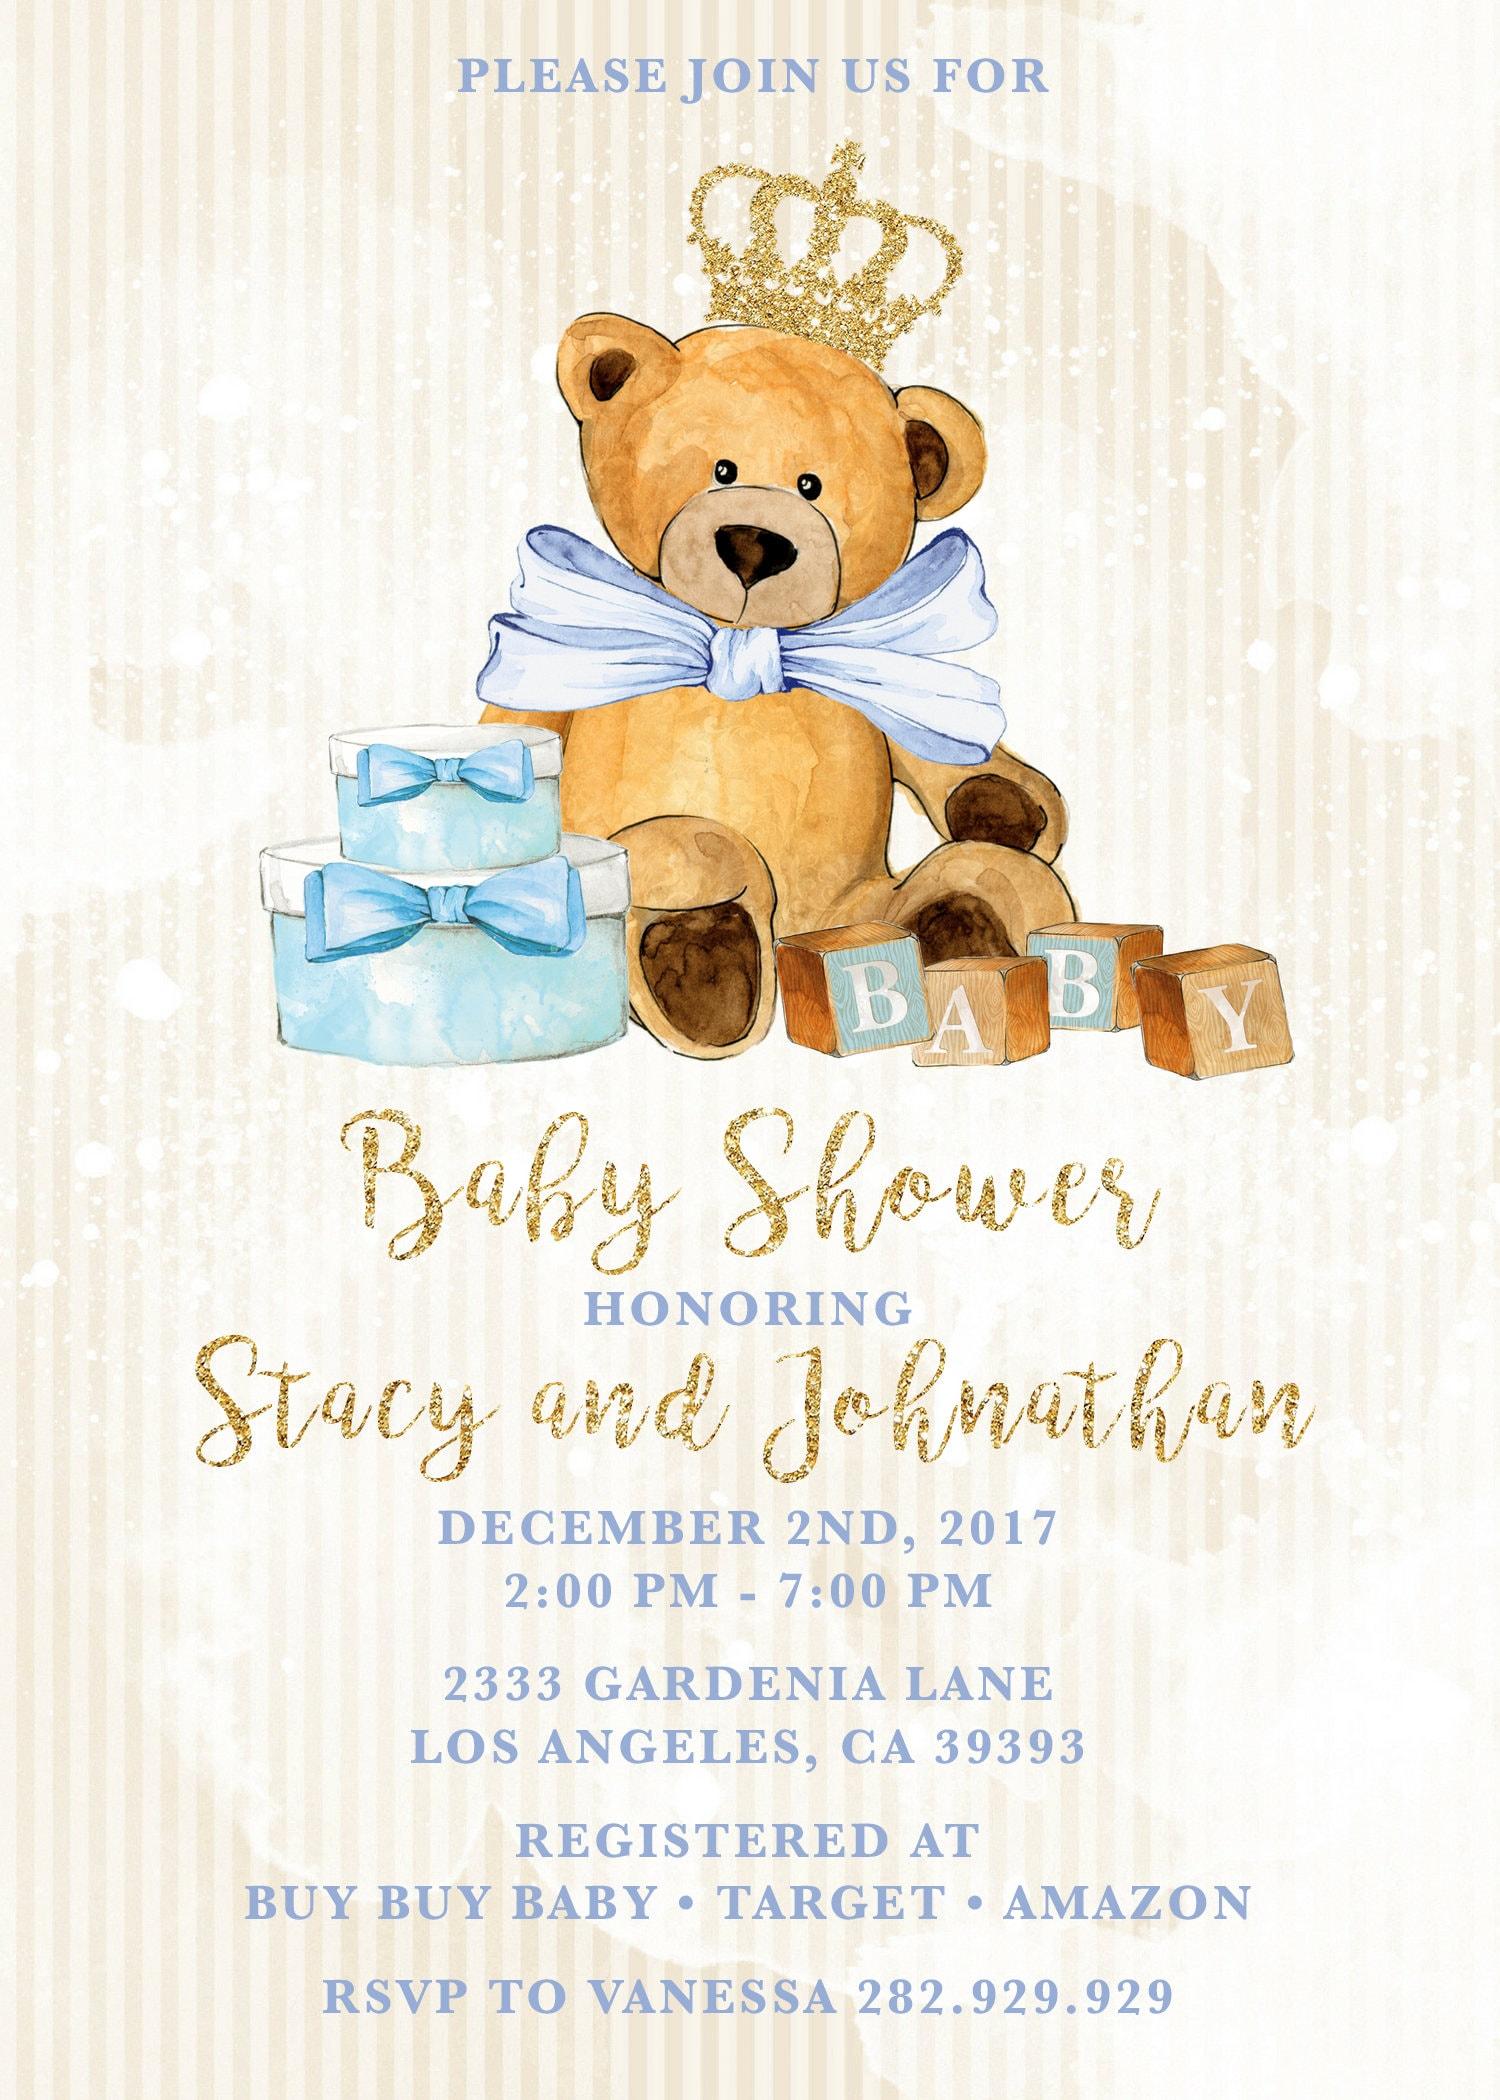 Royal Teddy Bear Baby Shower Teddy Bear Invitation Blue And Gold